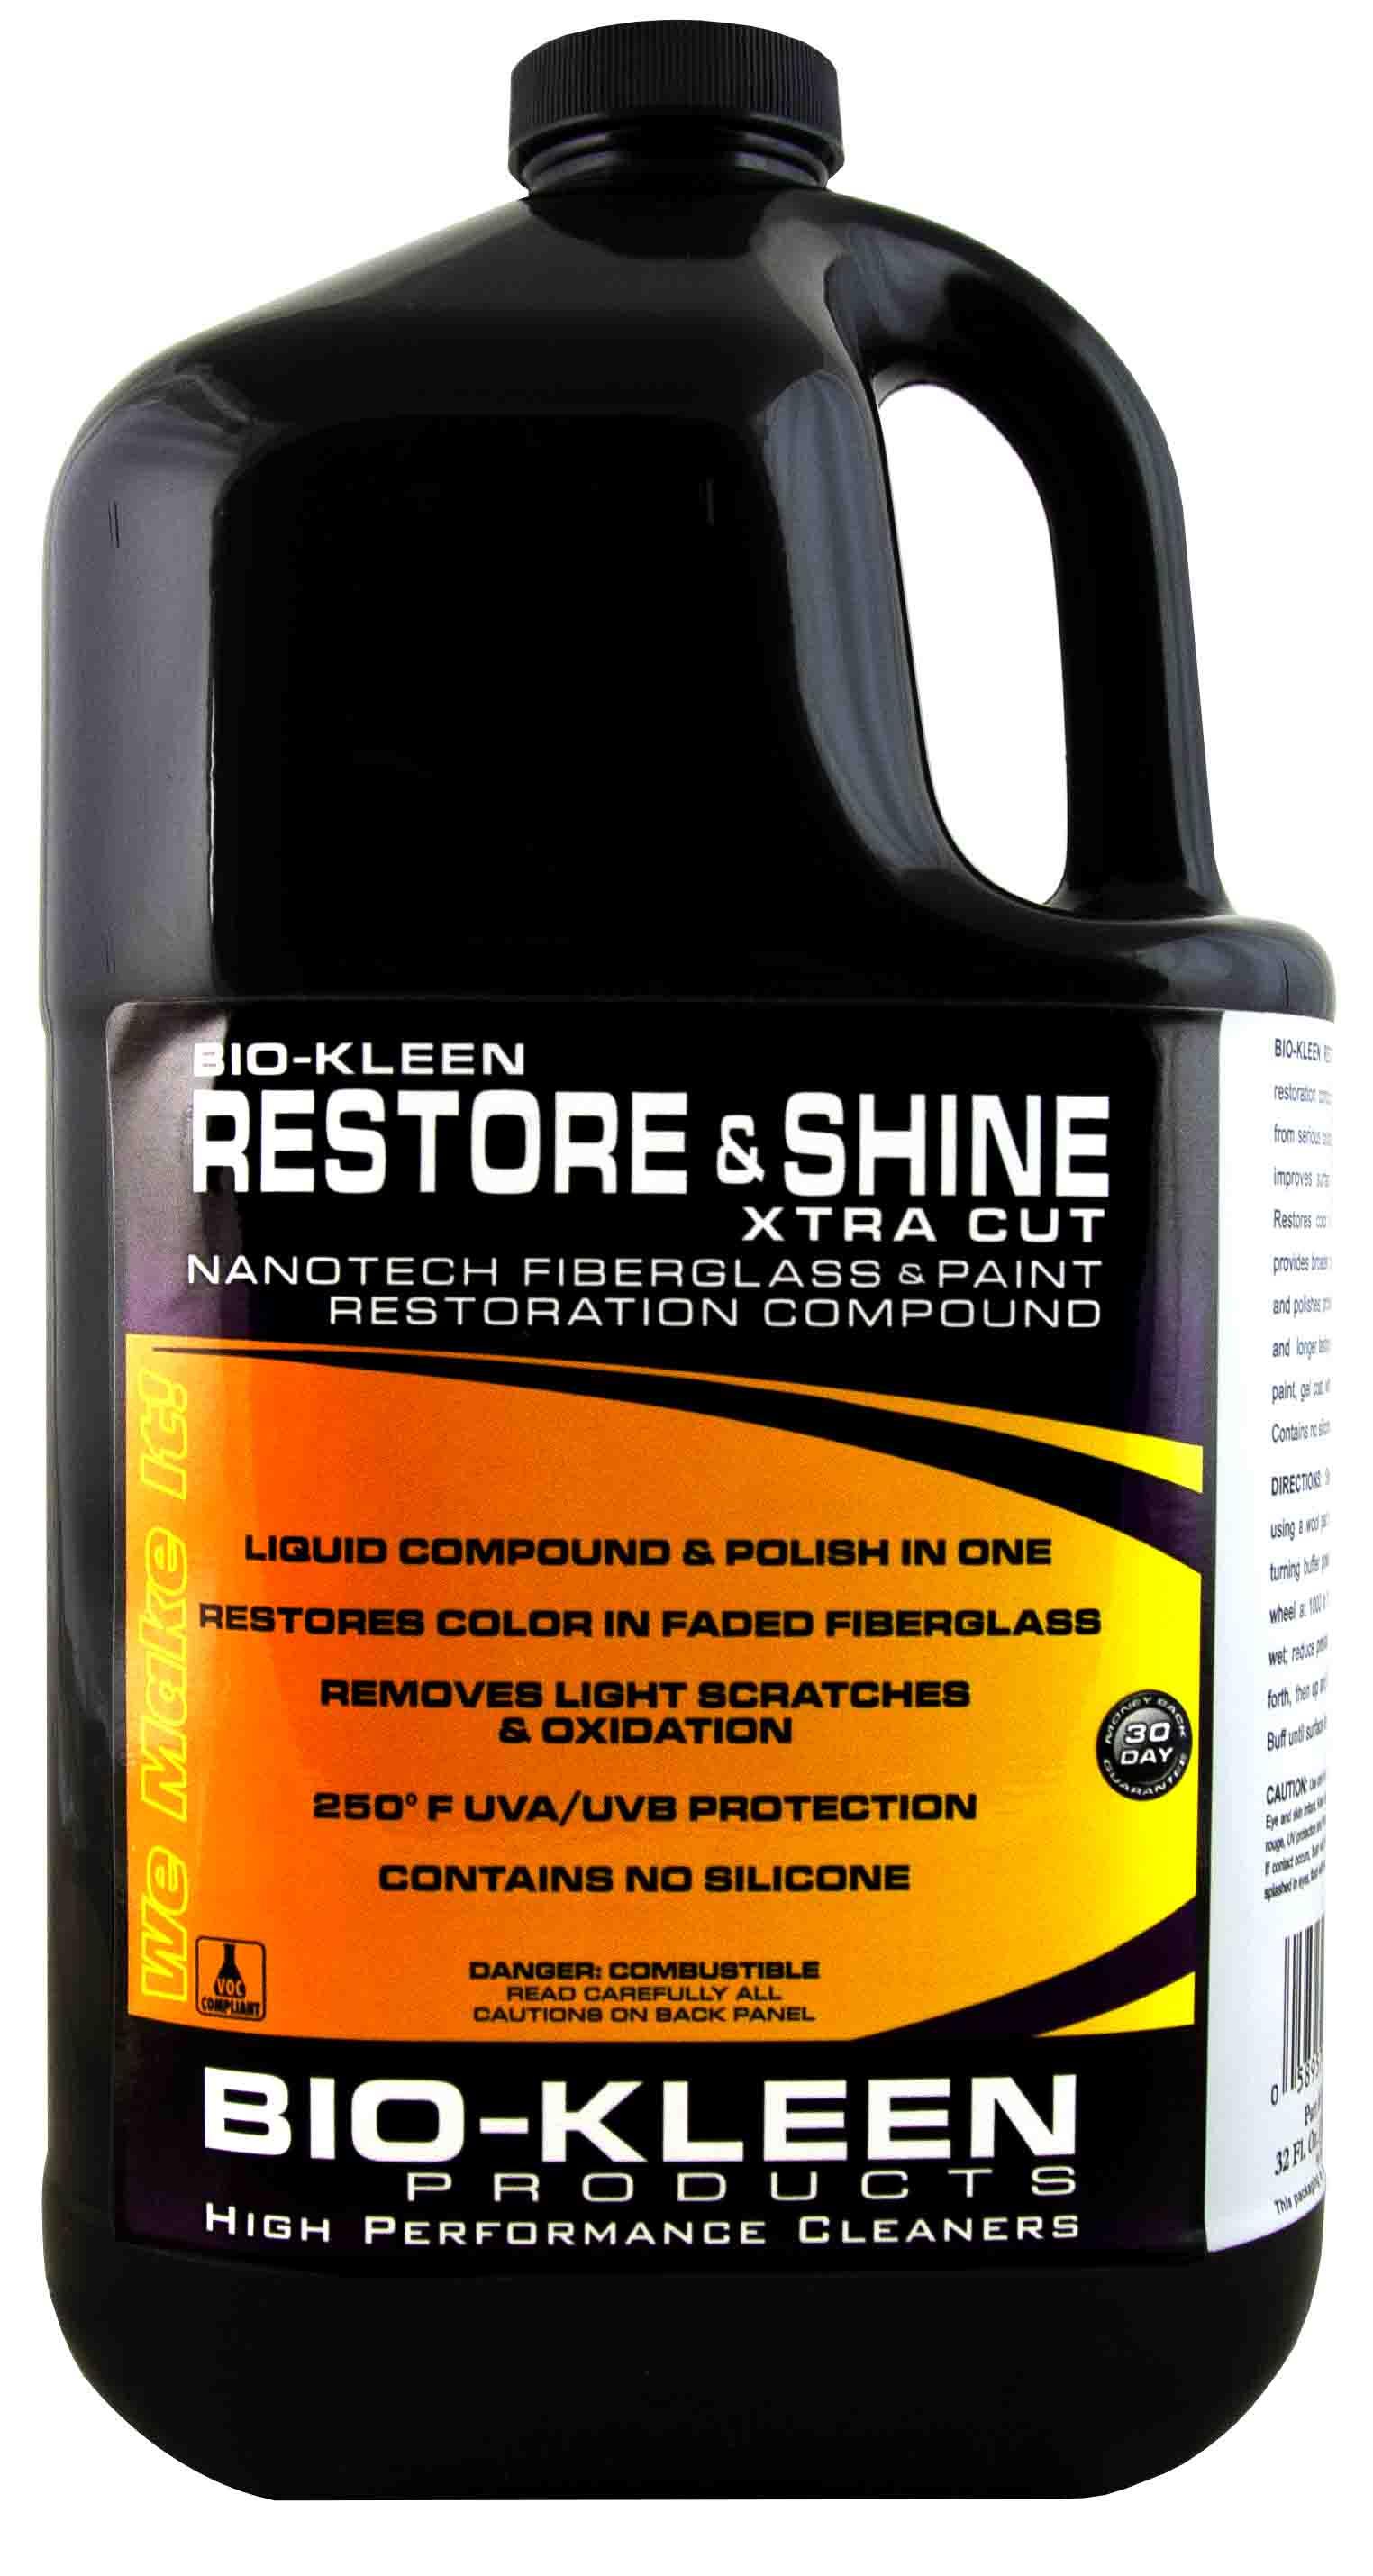 Restore & Shine Xtra Cut - Restoration Compound